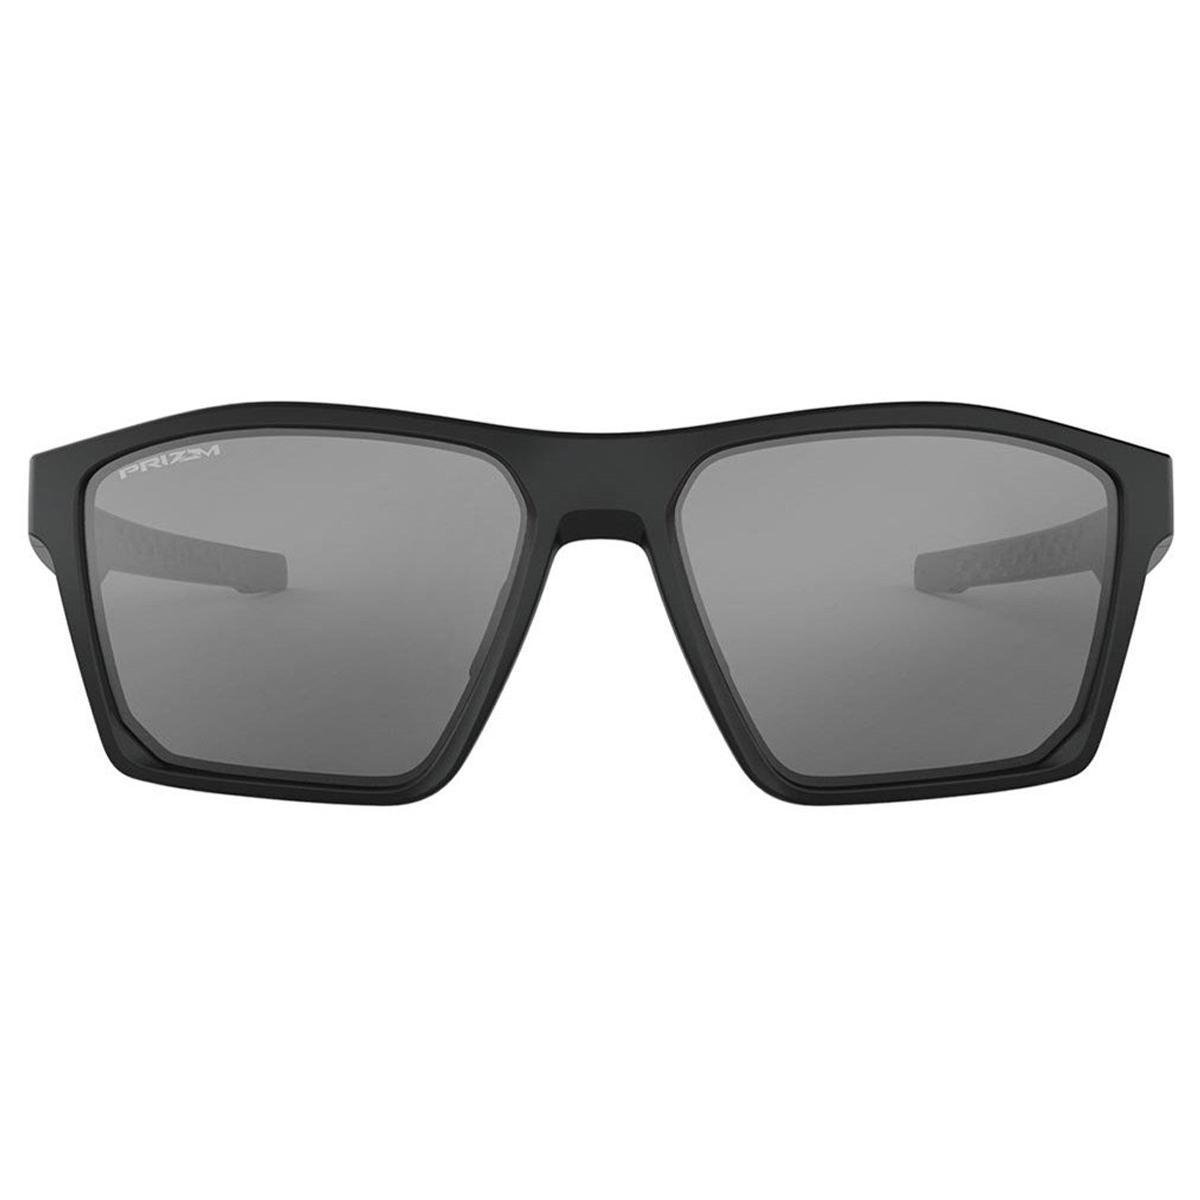 Óculos Oakley Targetline Matte Black   Prizm Black - Preto - Compre ... 3767690e53